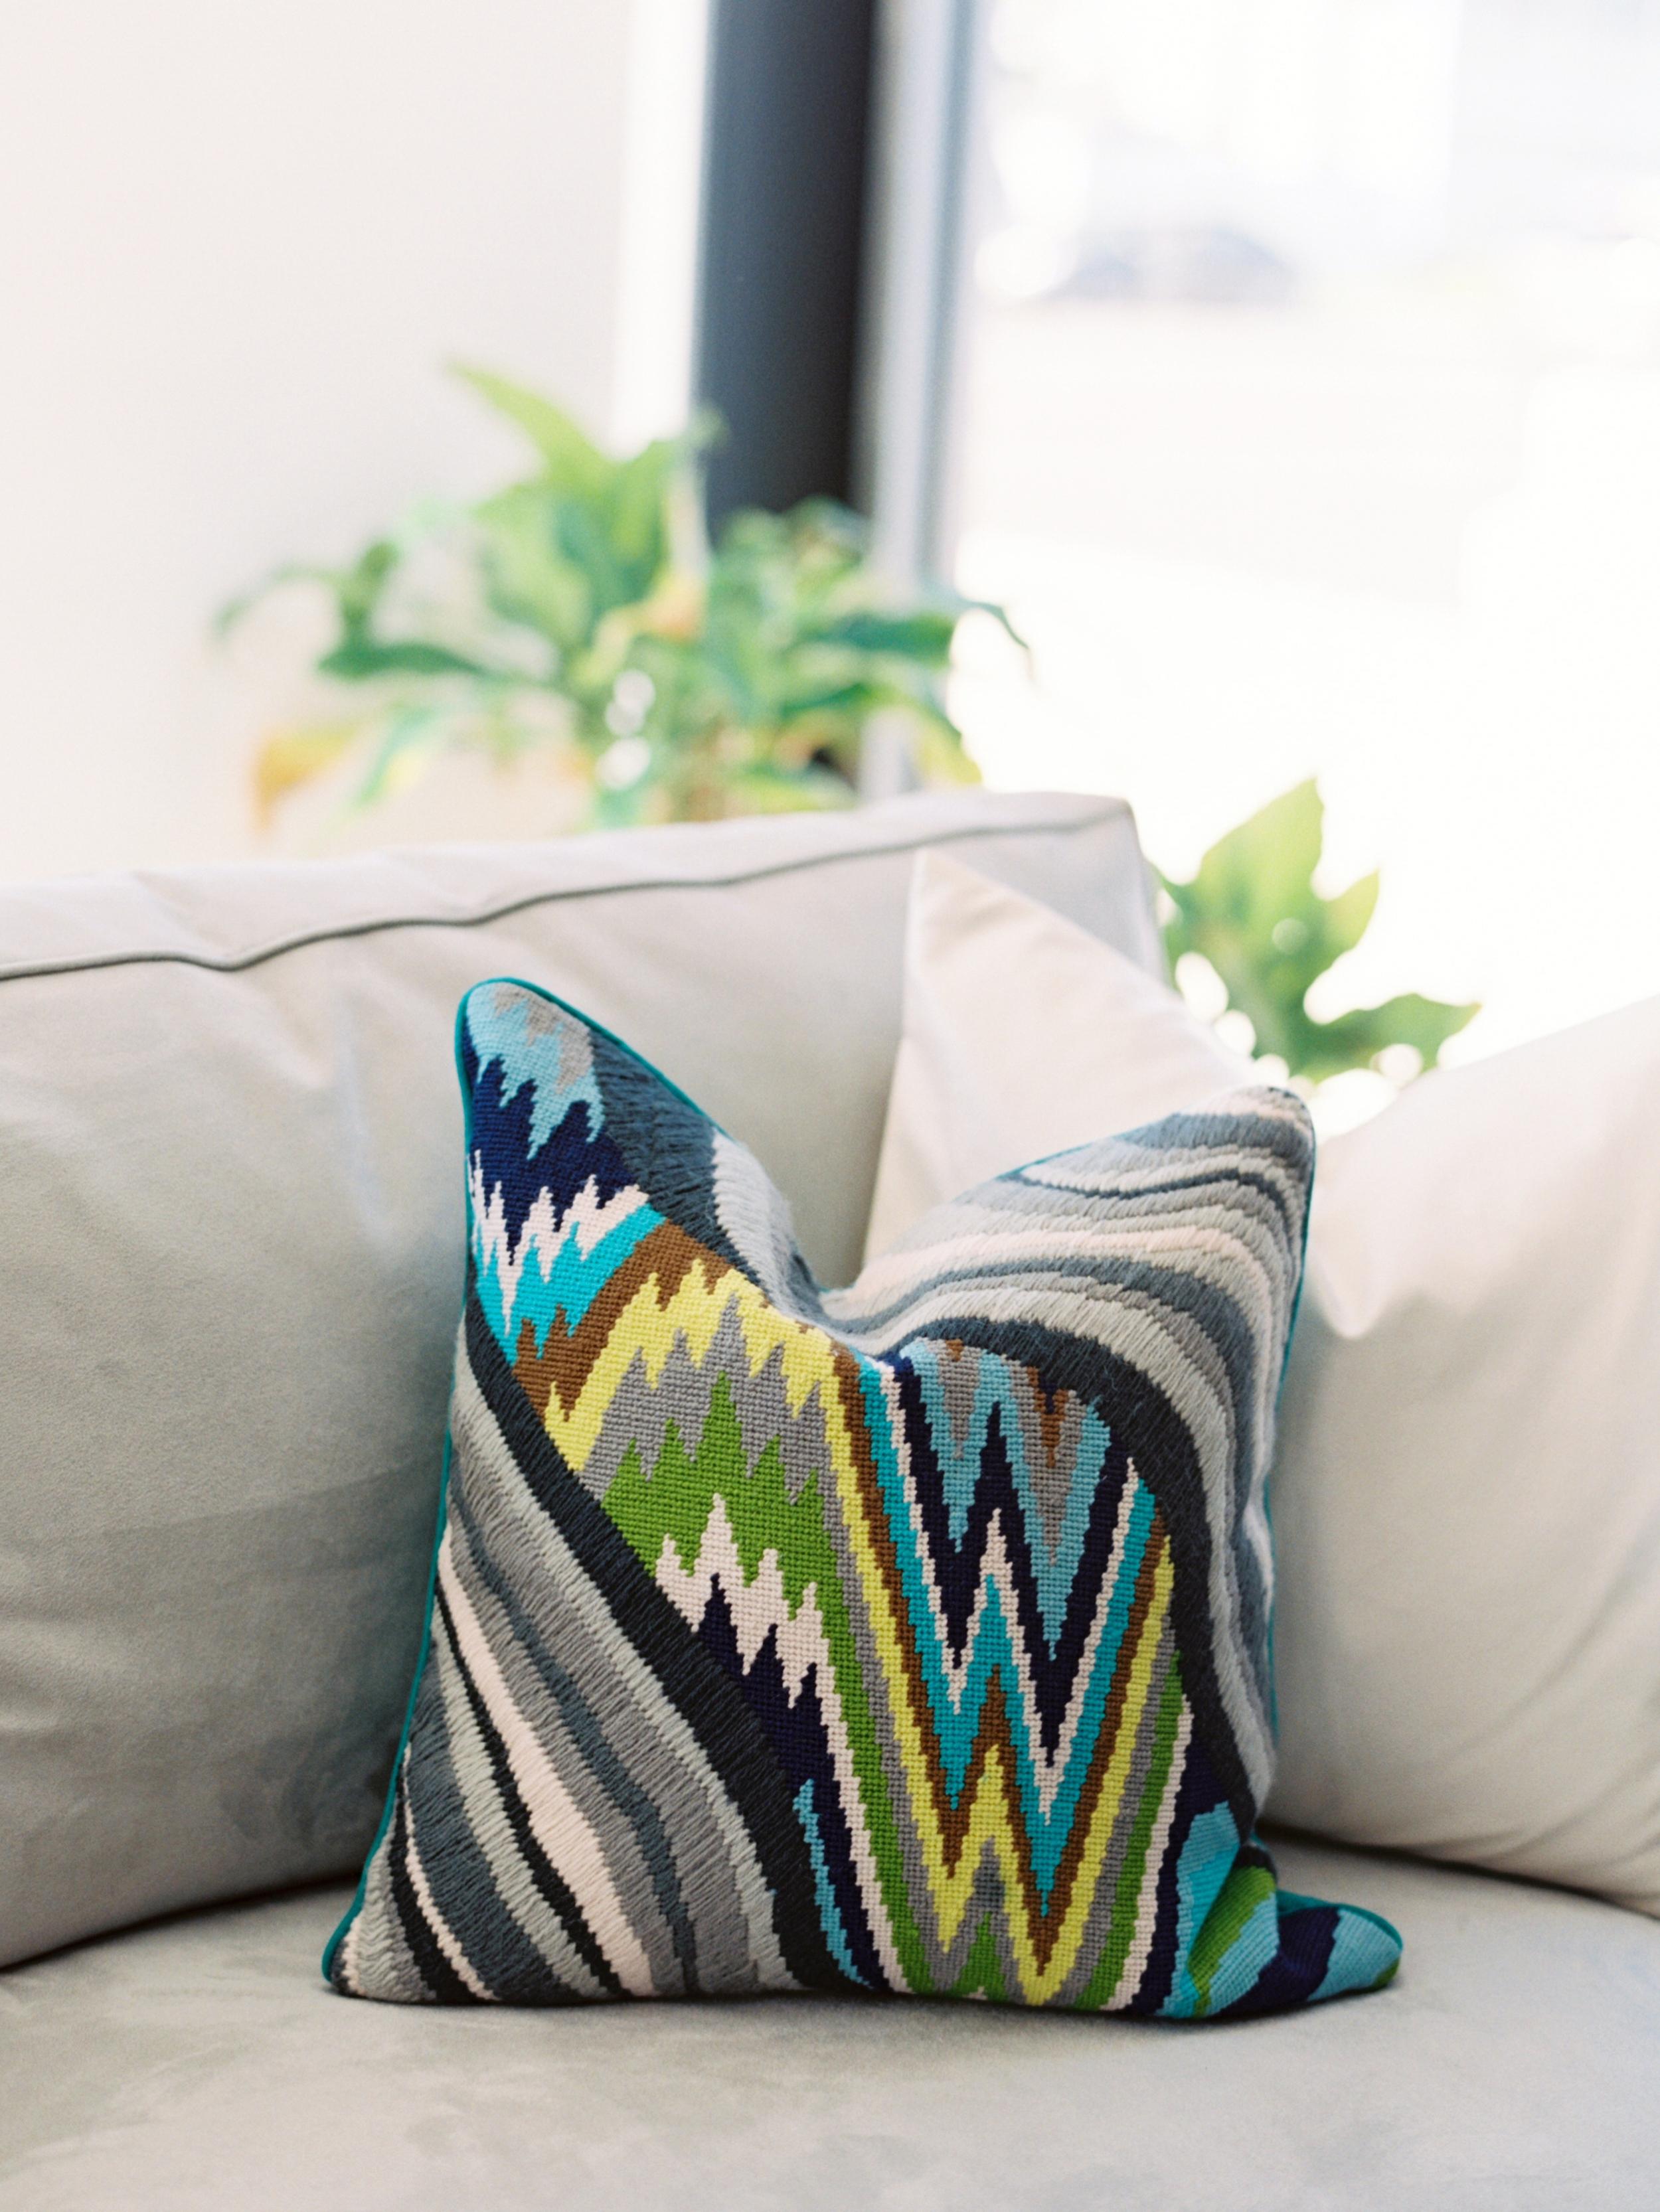 Johnathan Adler pillow